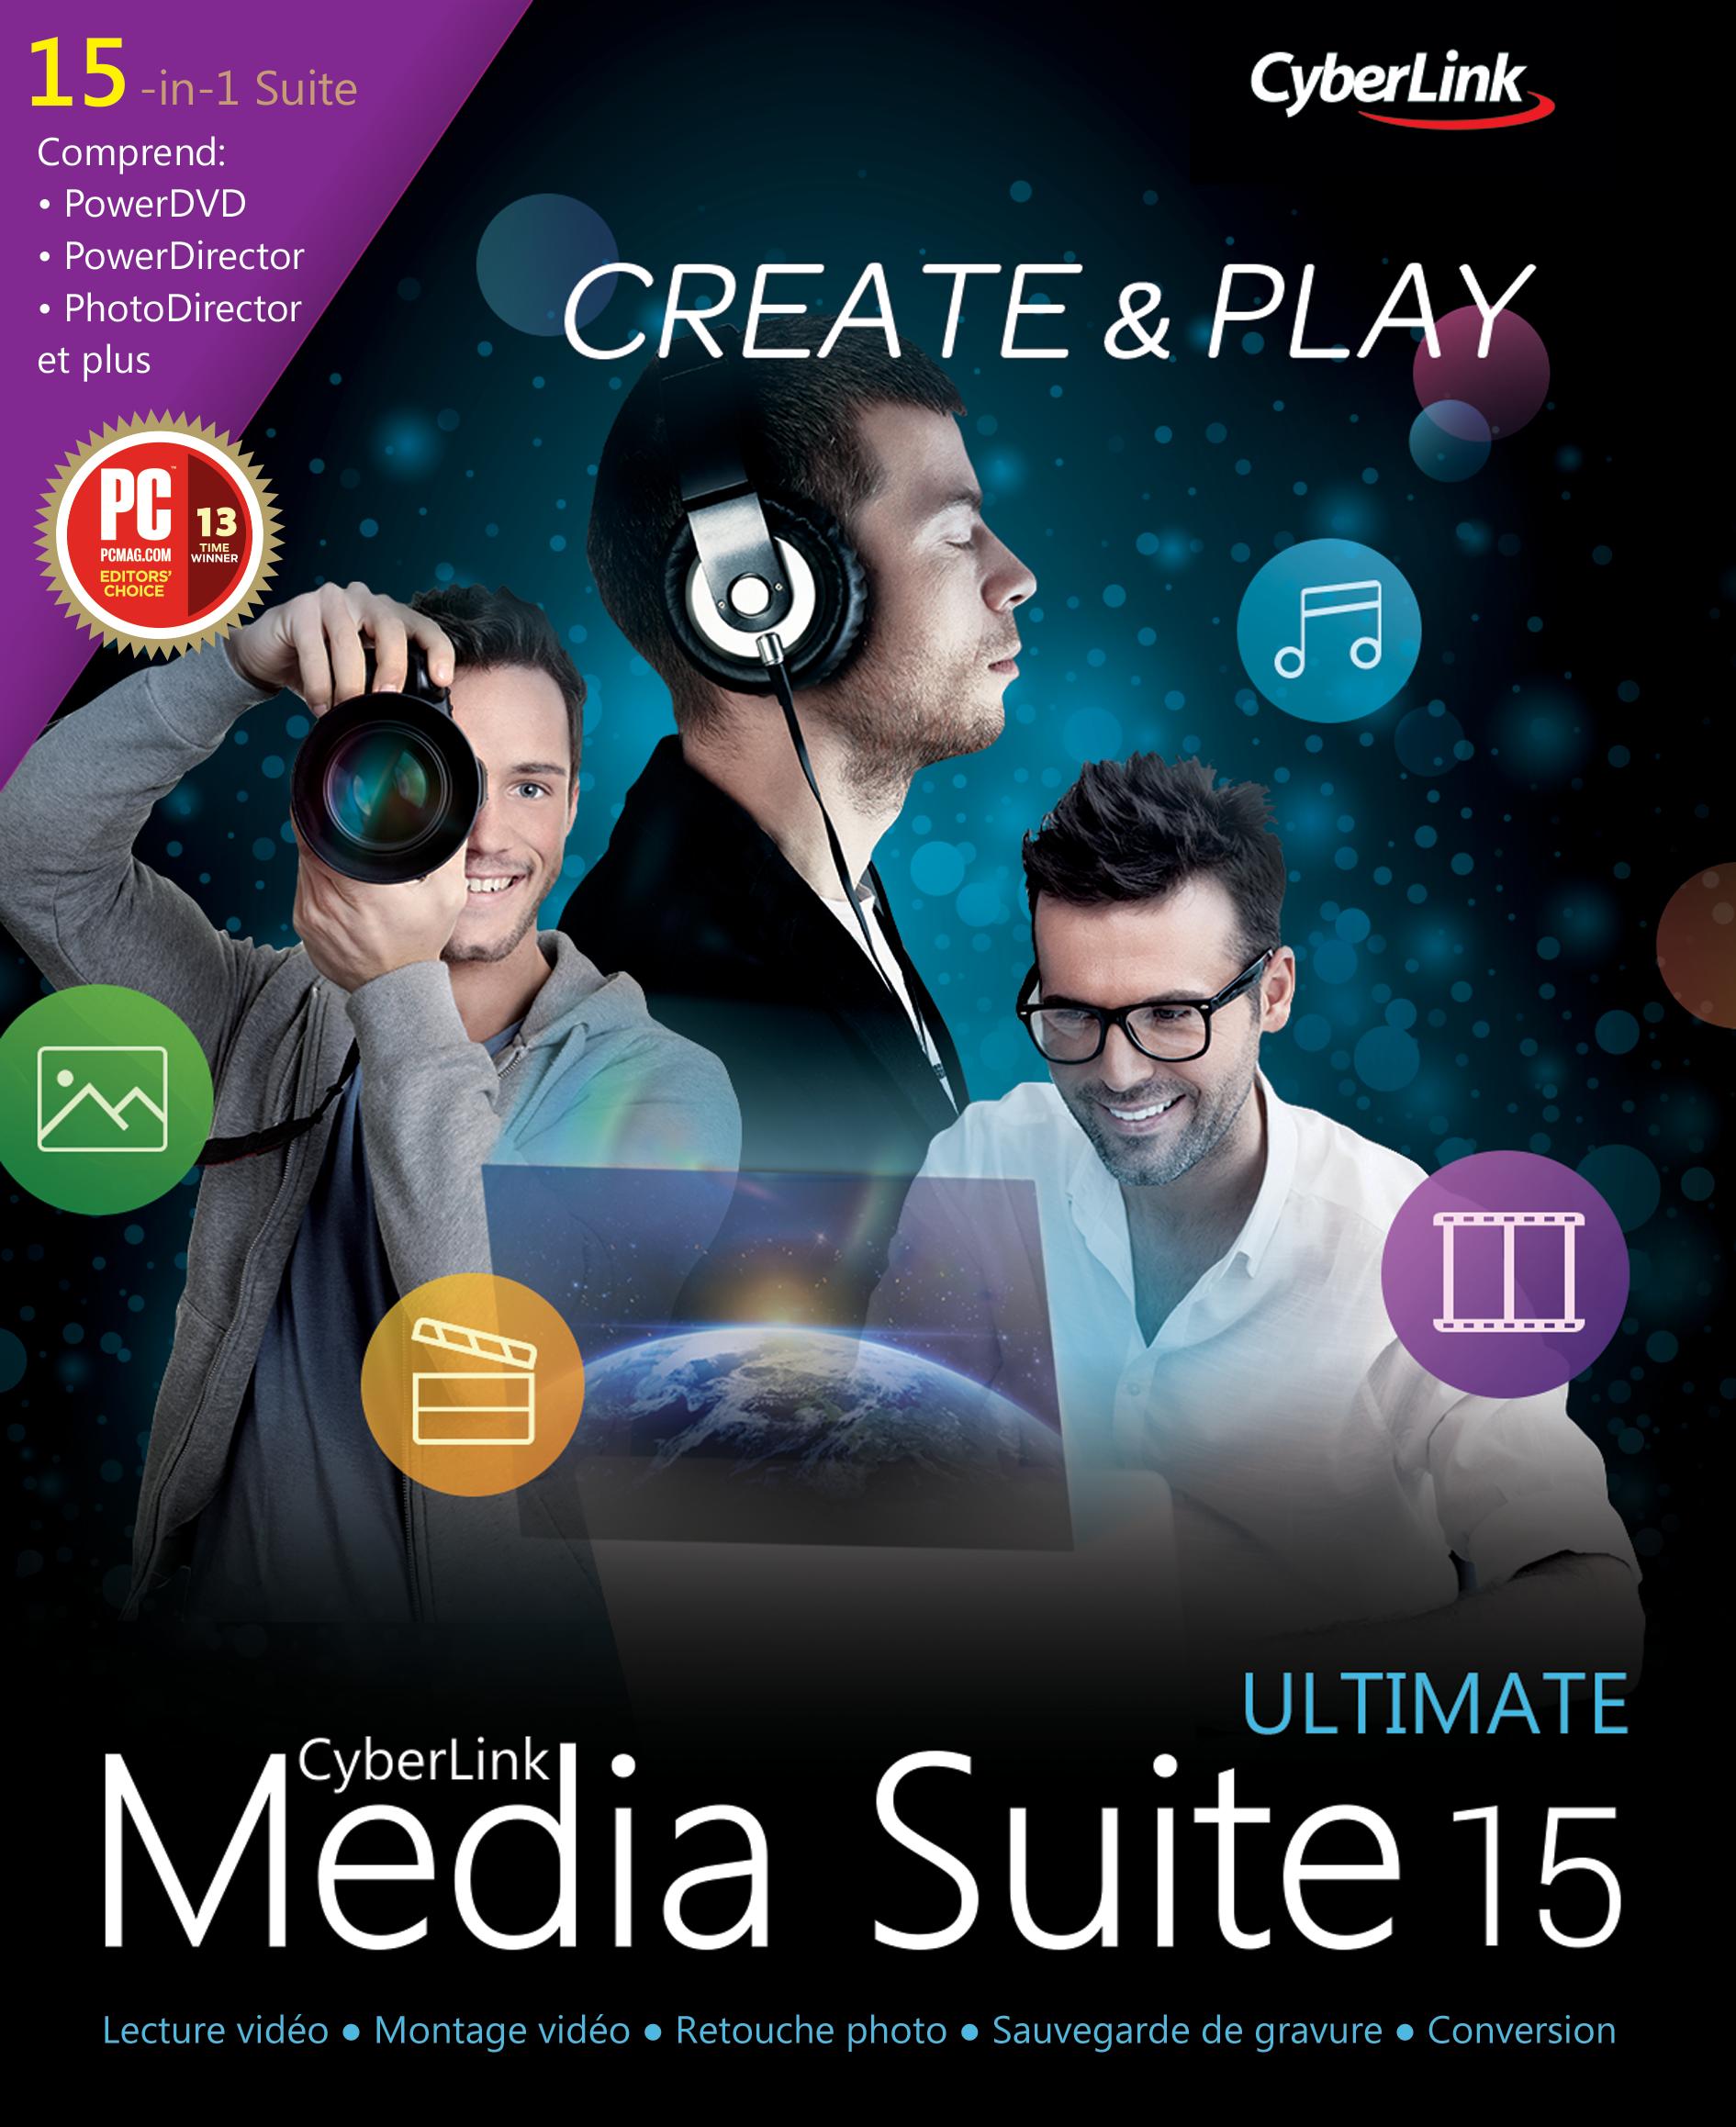 CyberLink Media Suite 15 Ultimate [Téléchargement]